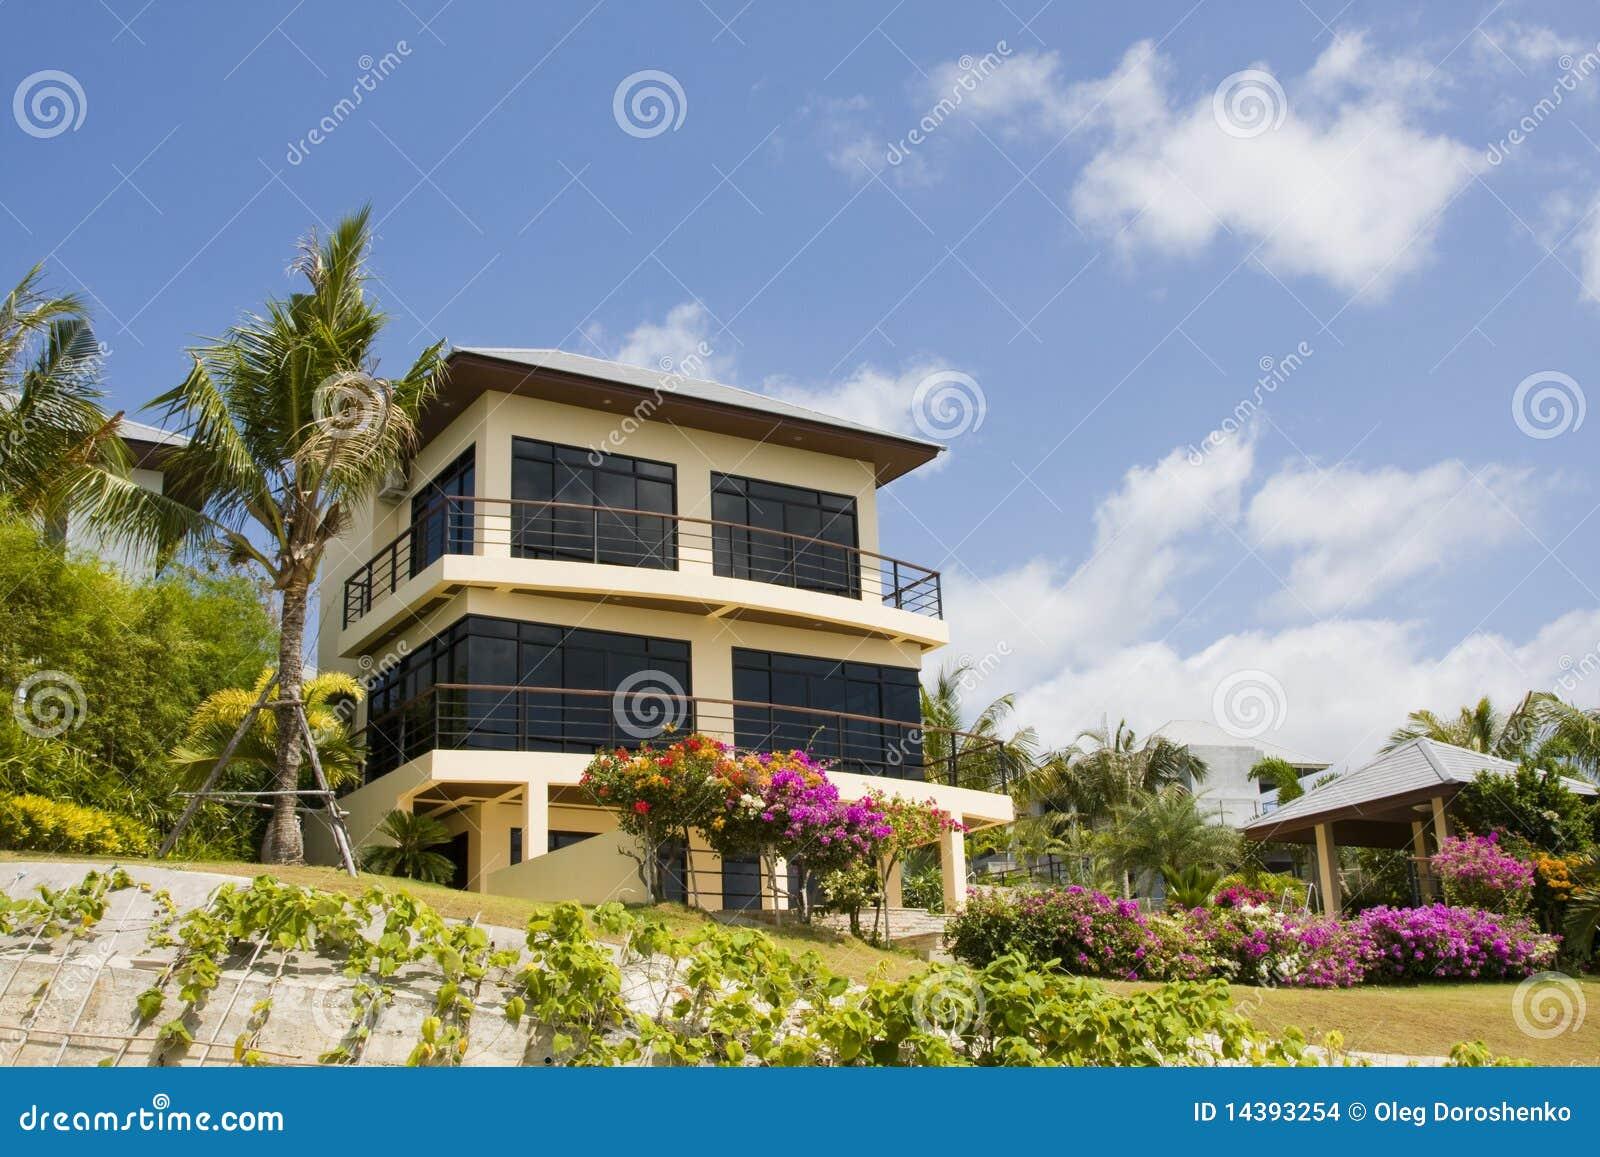 Gardens inspiration and tropical